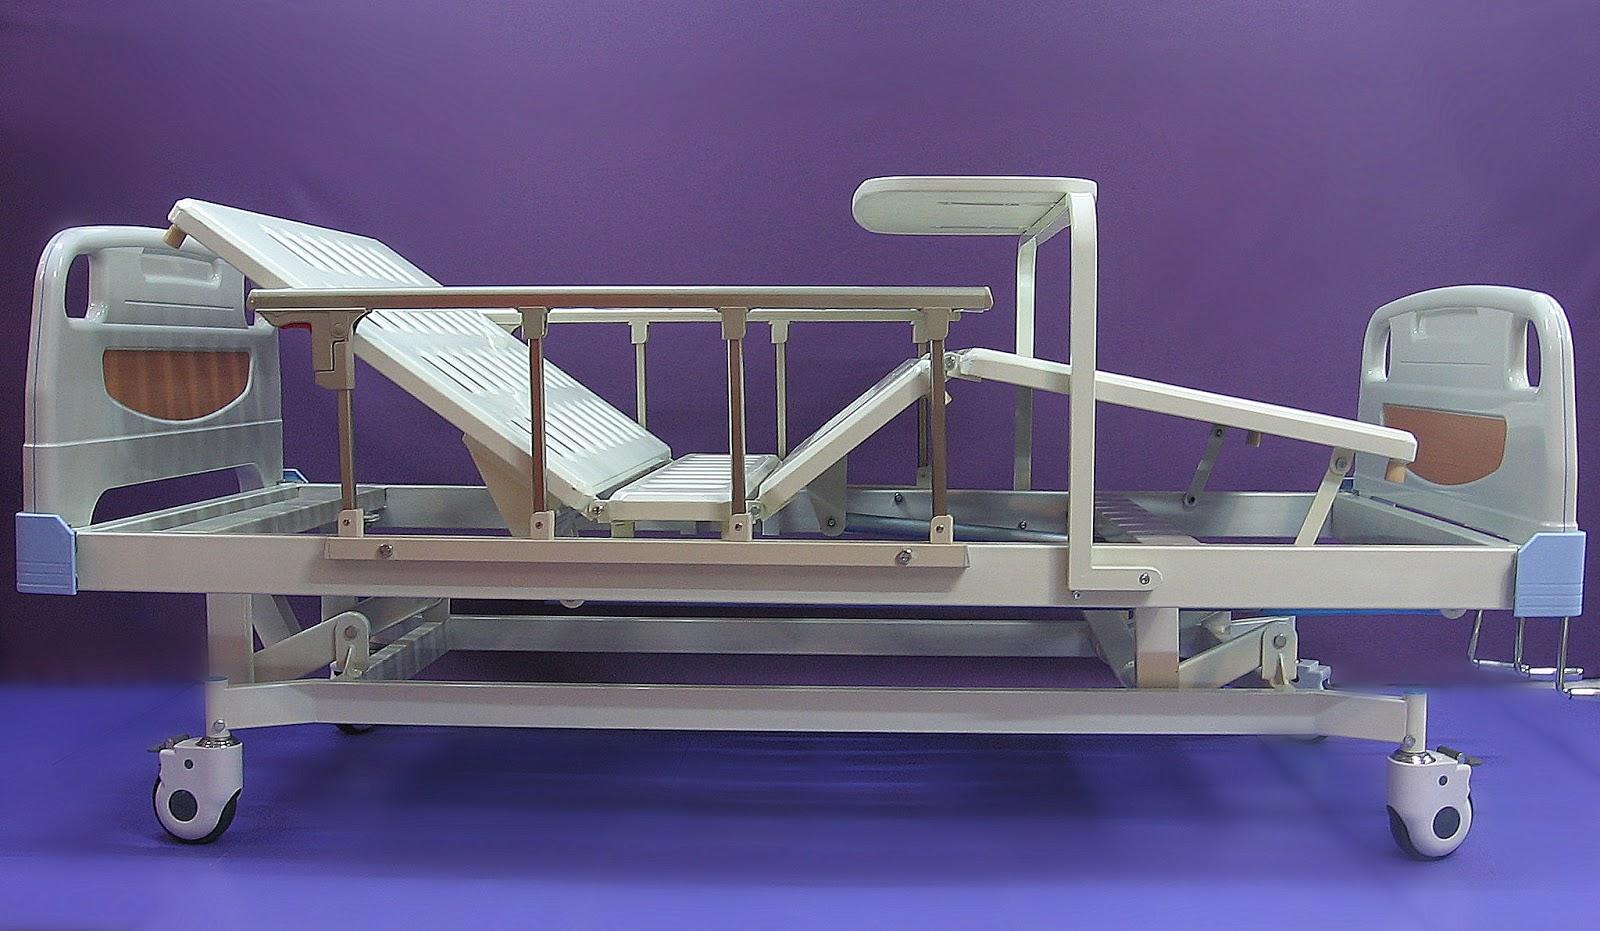 5. Hospital bed HI-LO manual three functions 三功能 手动 医院床 整張床面可調高低